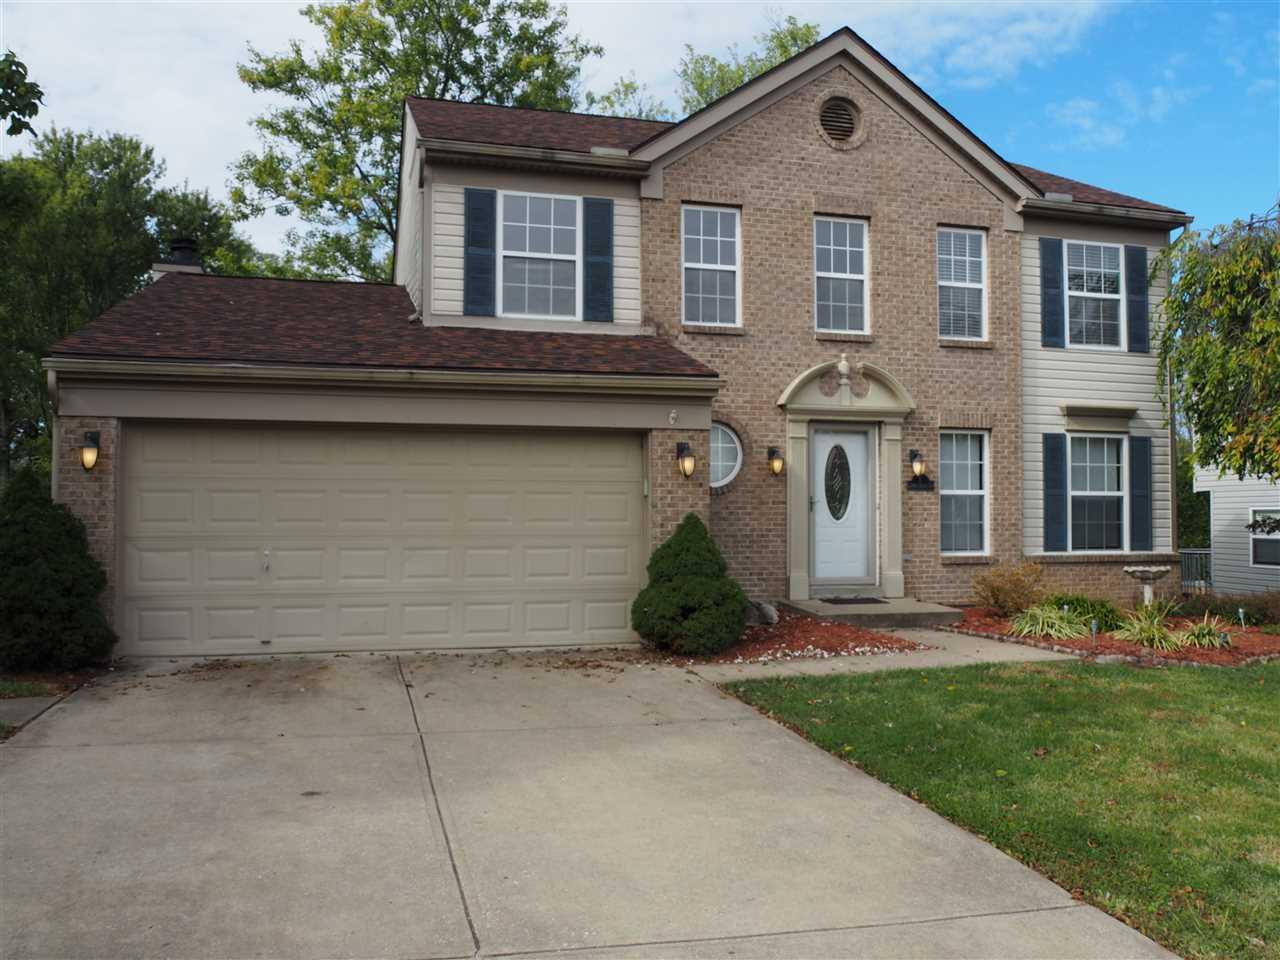 Photo 2 for 1 Laurel Ridge Dr Alexandria, KY 41001